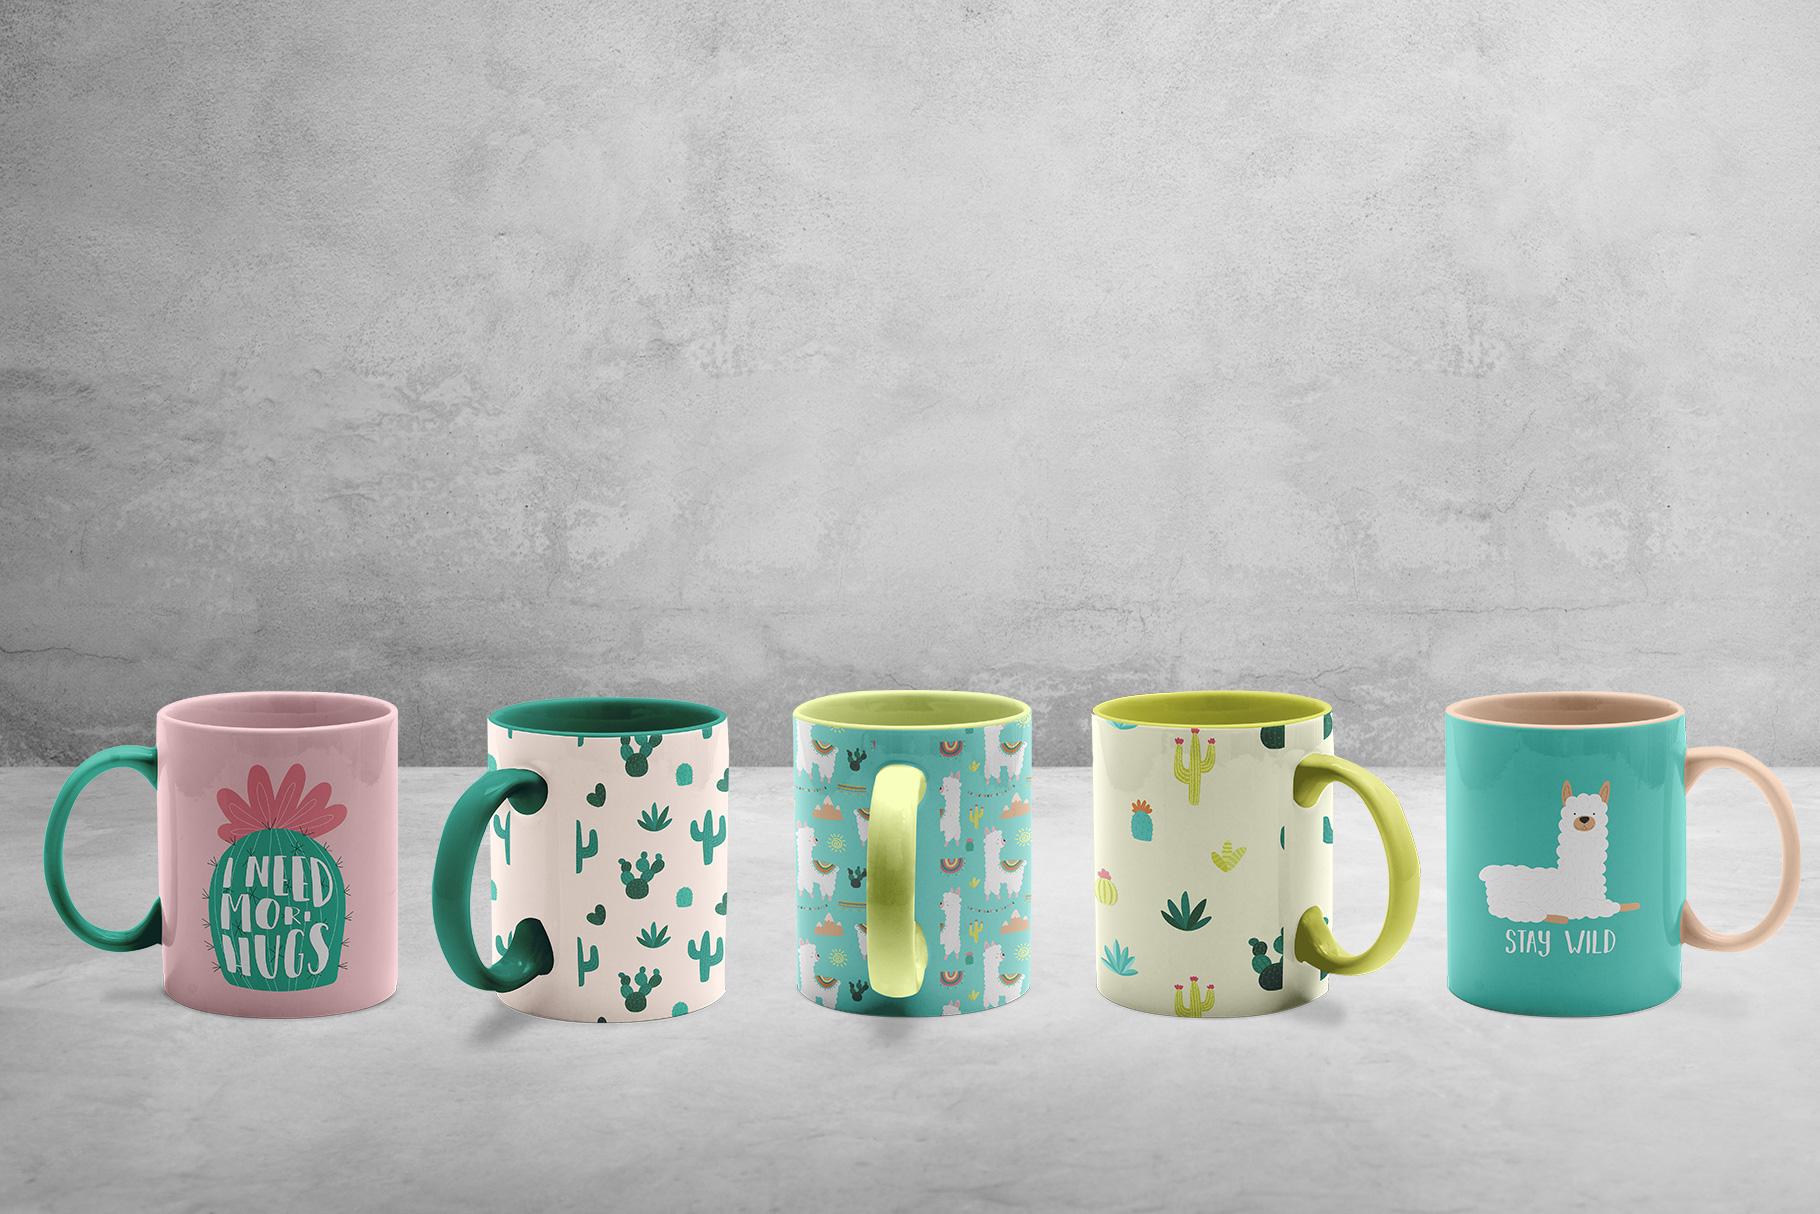 background options of the ceramic coffee mugs mockup set